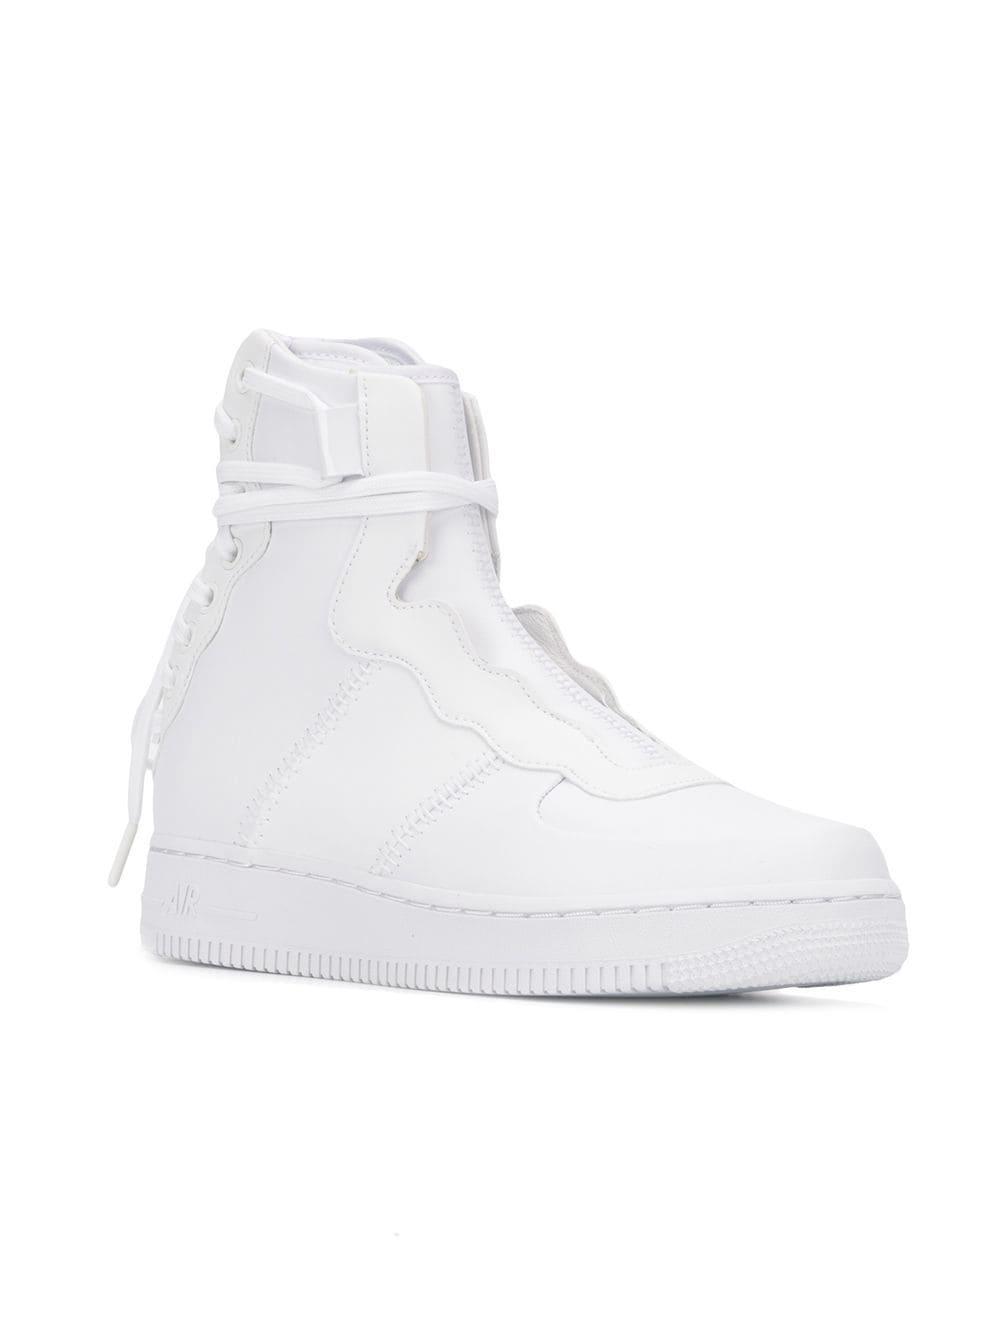 7989824947b7 Nike - White Air Force 1 Rebel Xx Sneakers - Lyst. View fullscreen